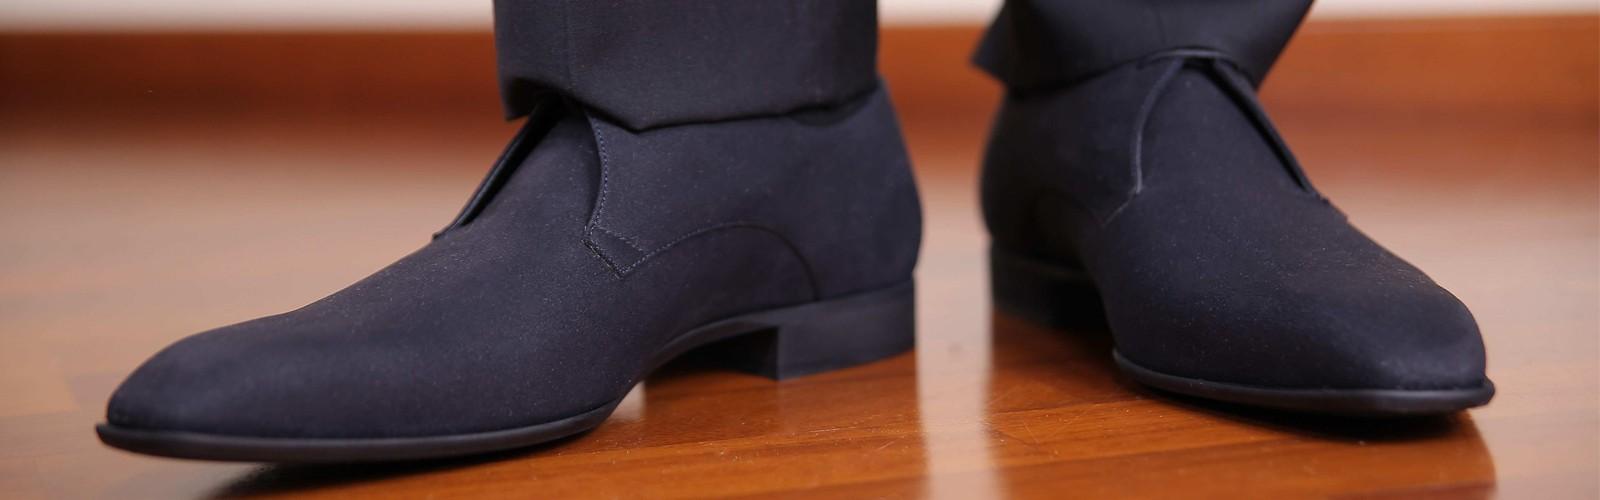 Chaussures Hommes Vegan